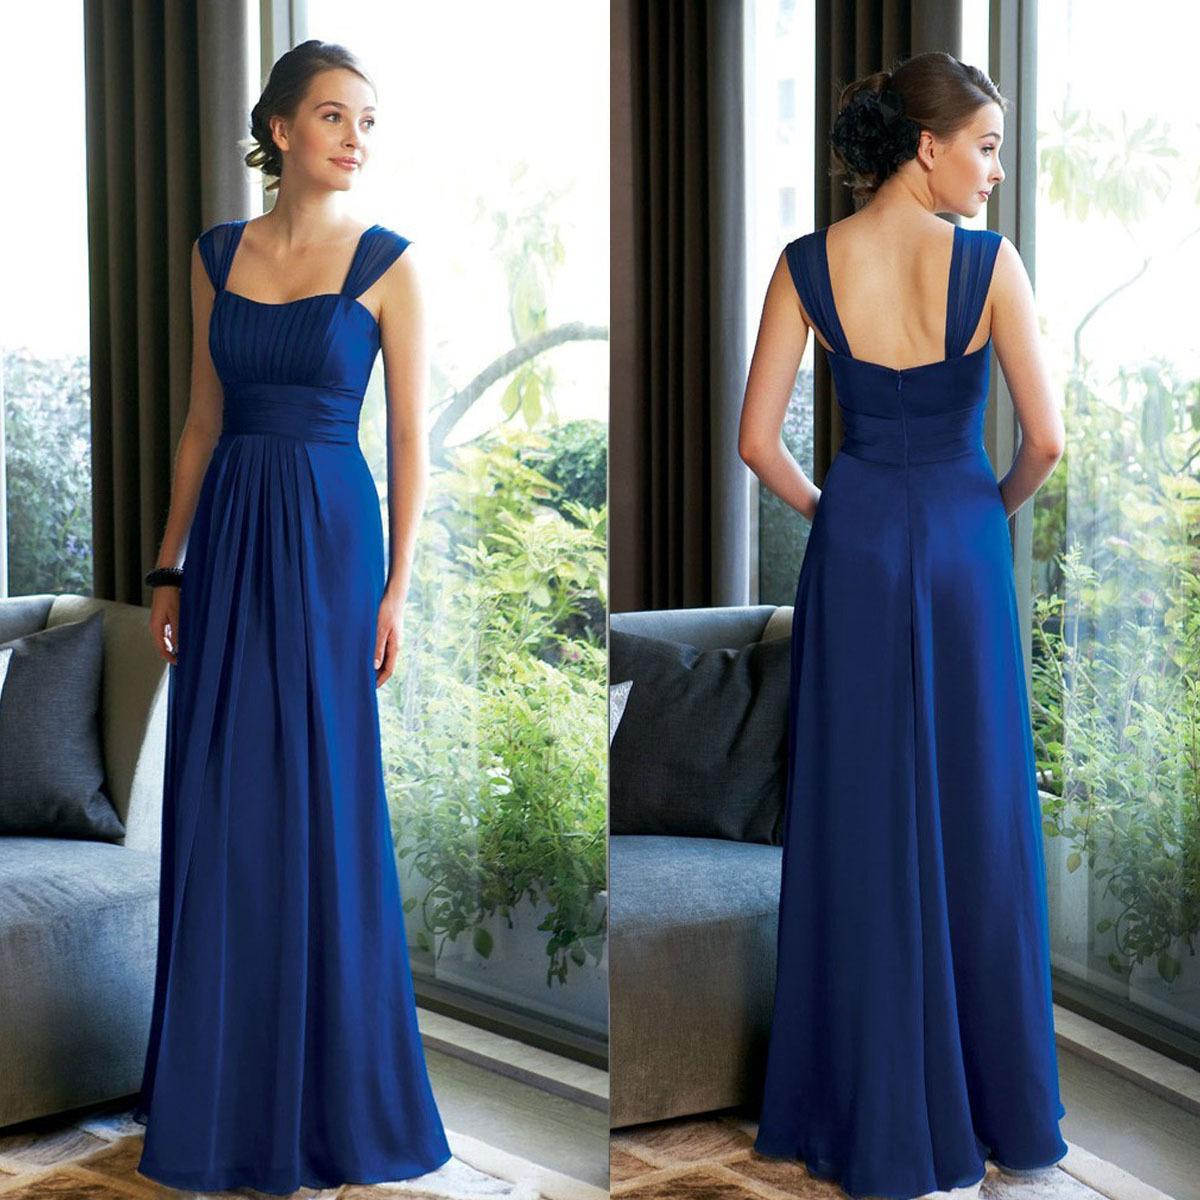 Cheap under 50 bridesmaid dresses